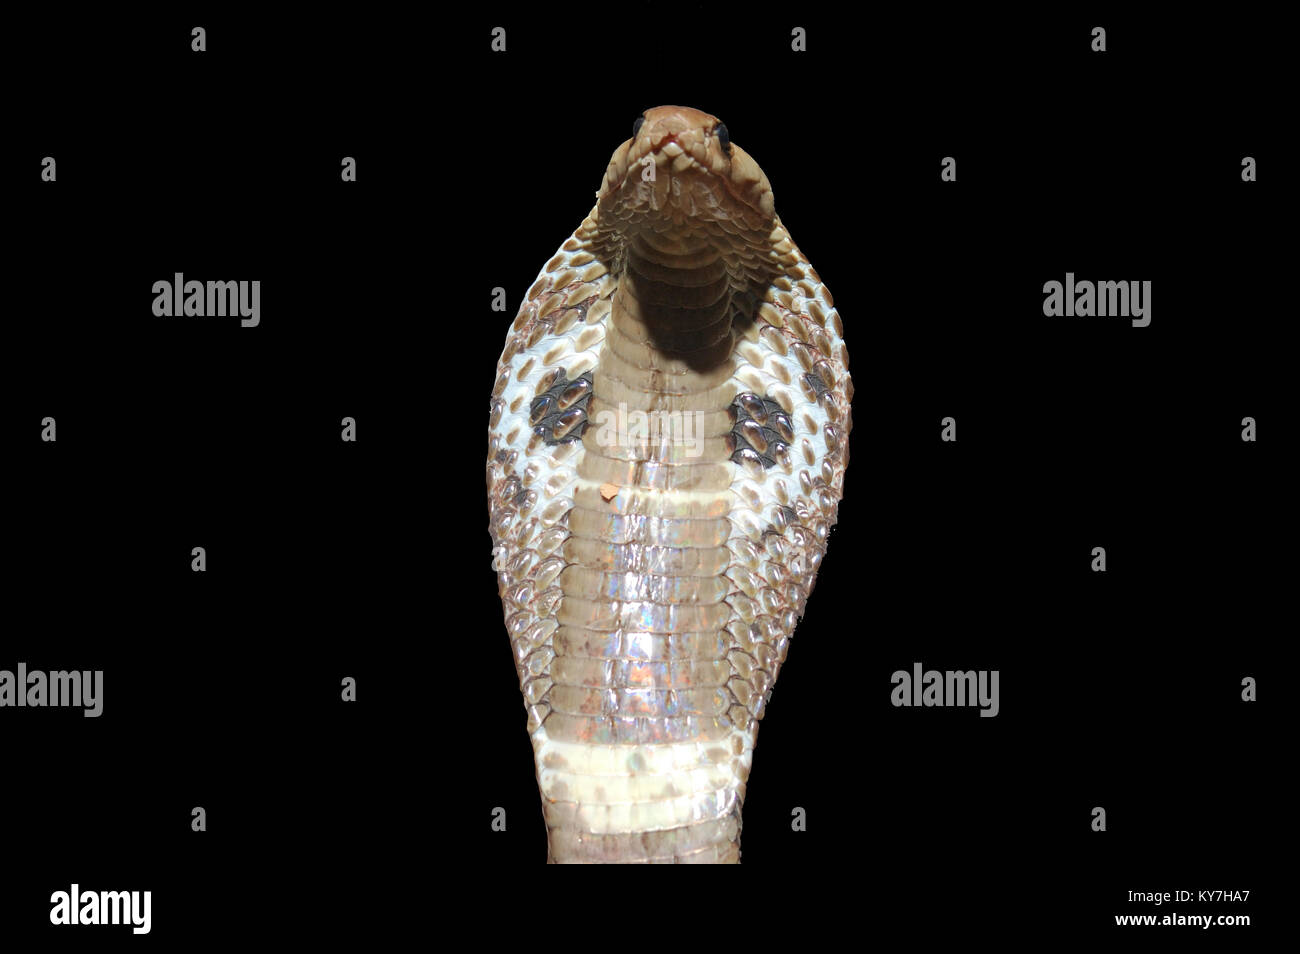 Indian Cobra, Naja naja, with flared hood against black background,Tamil Nadu, South India - Stock Image